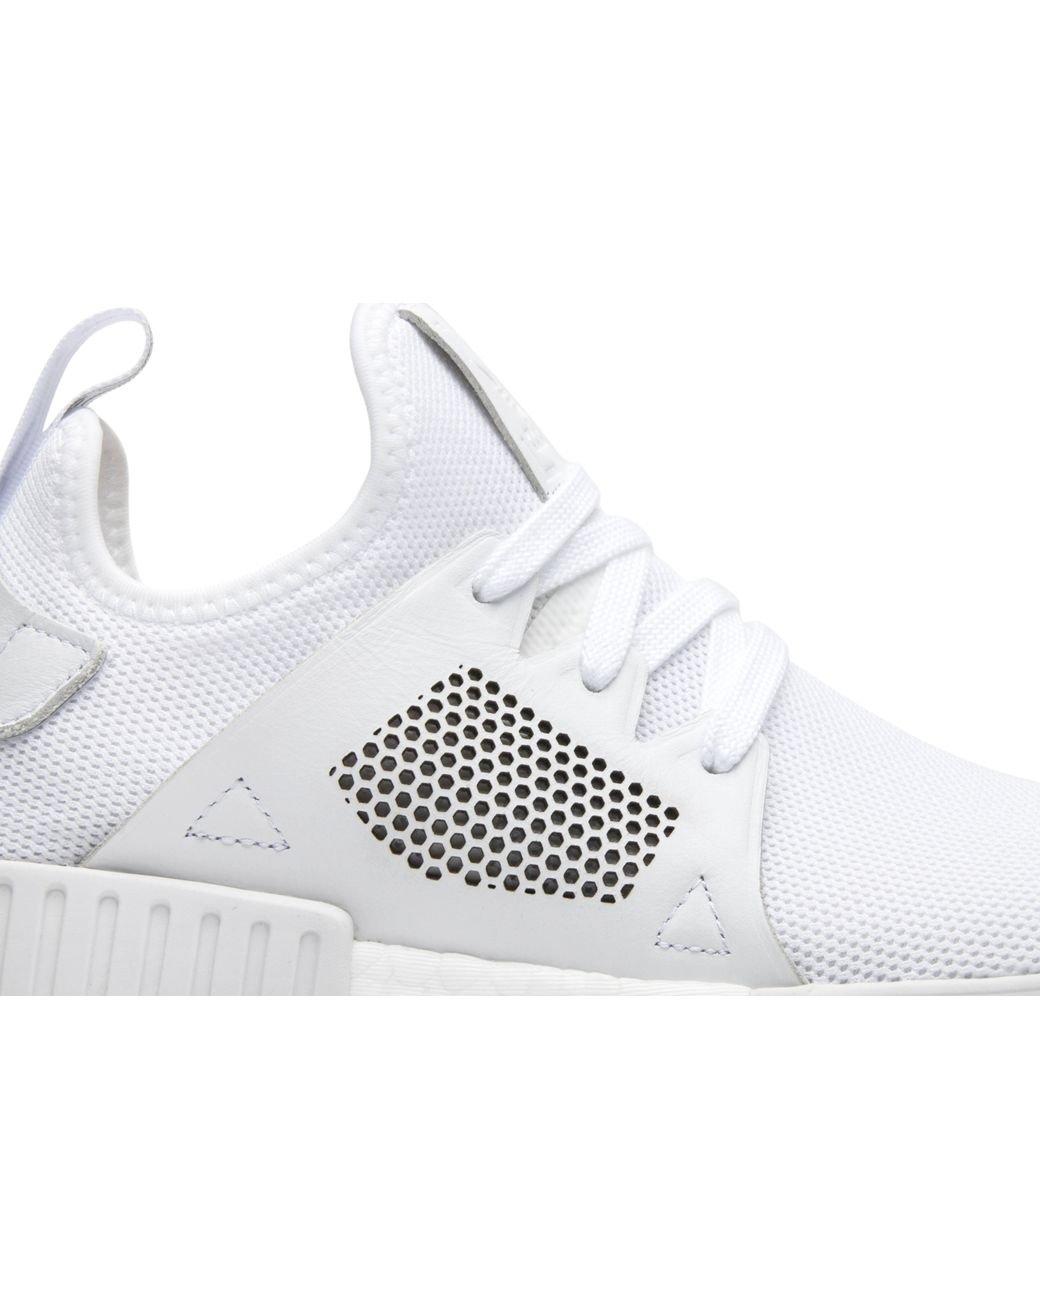 adidas turbulence white